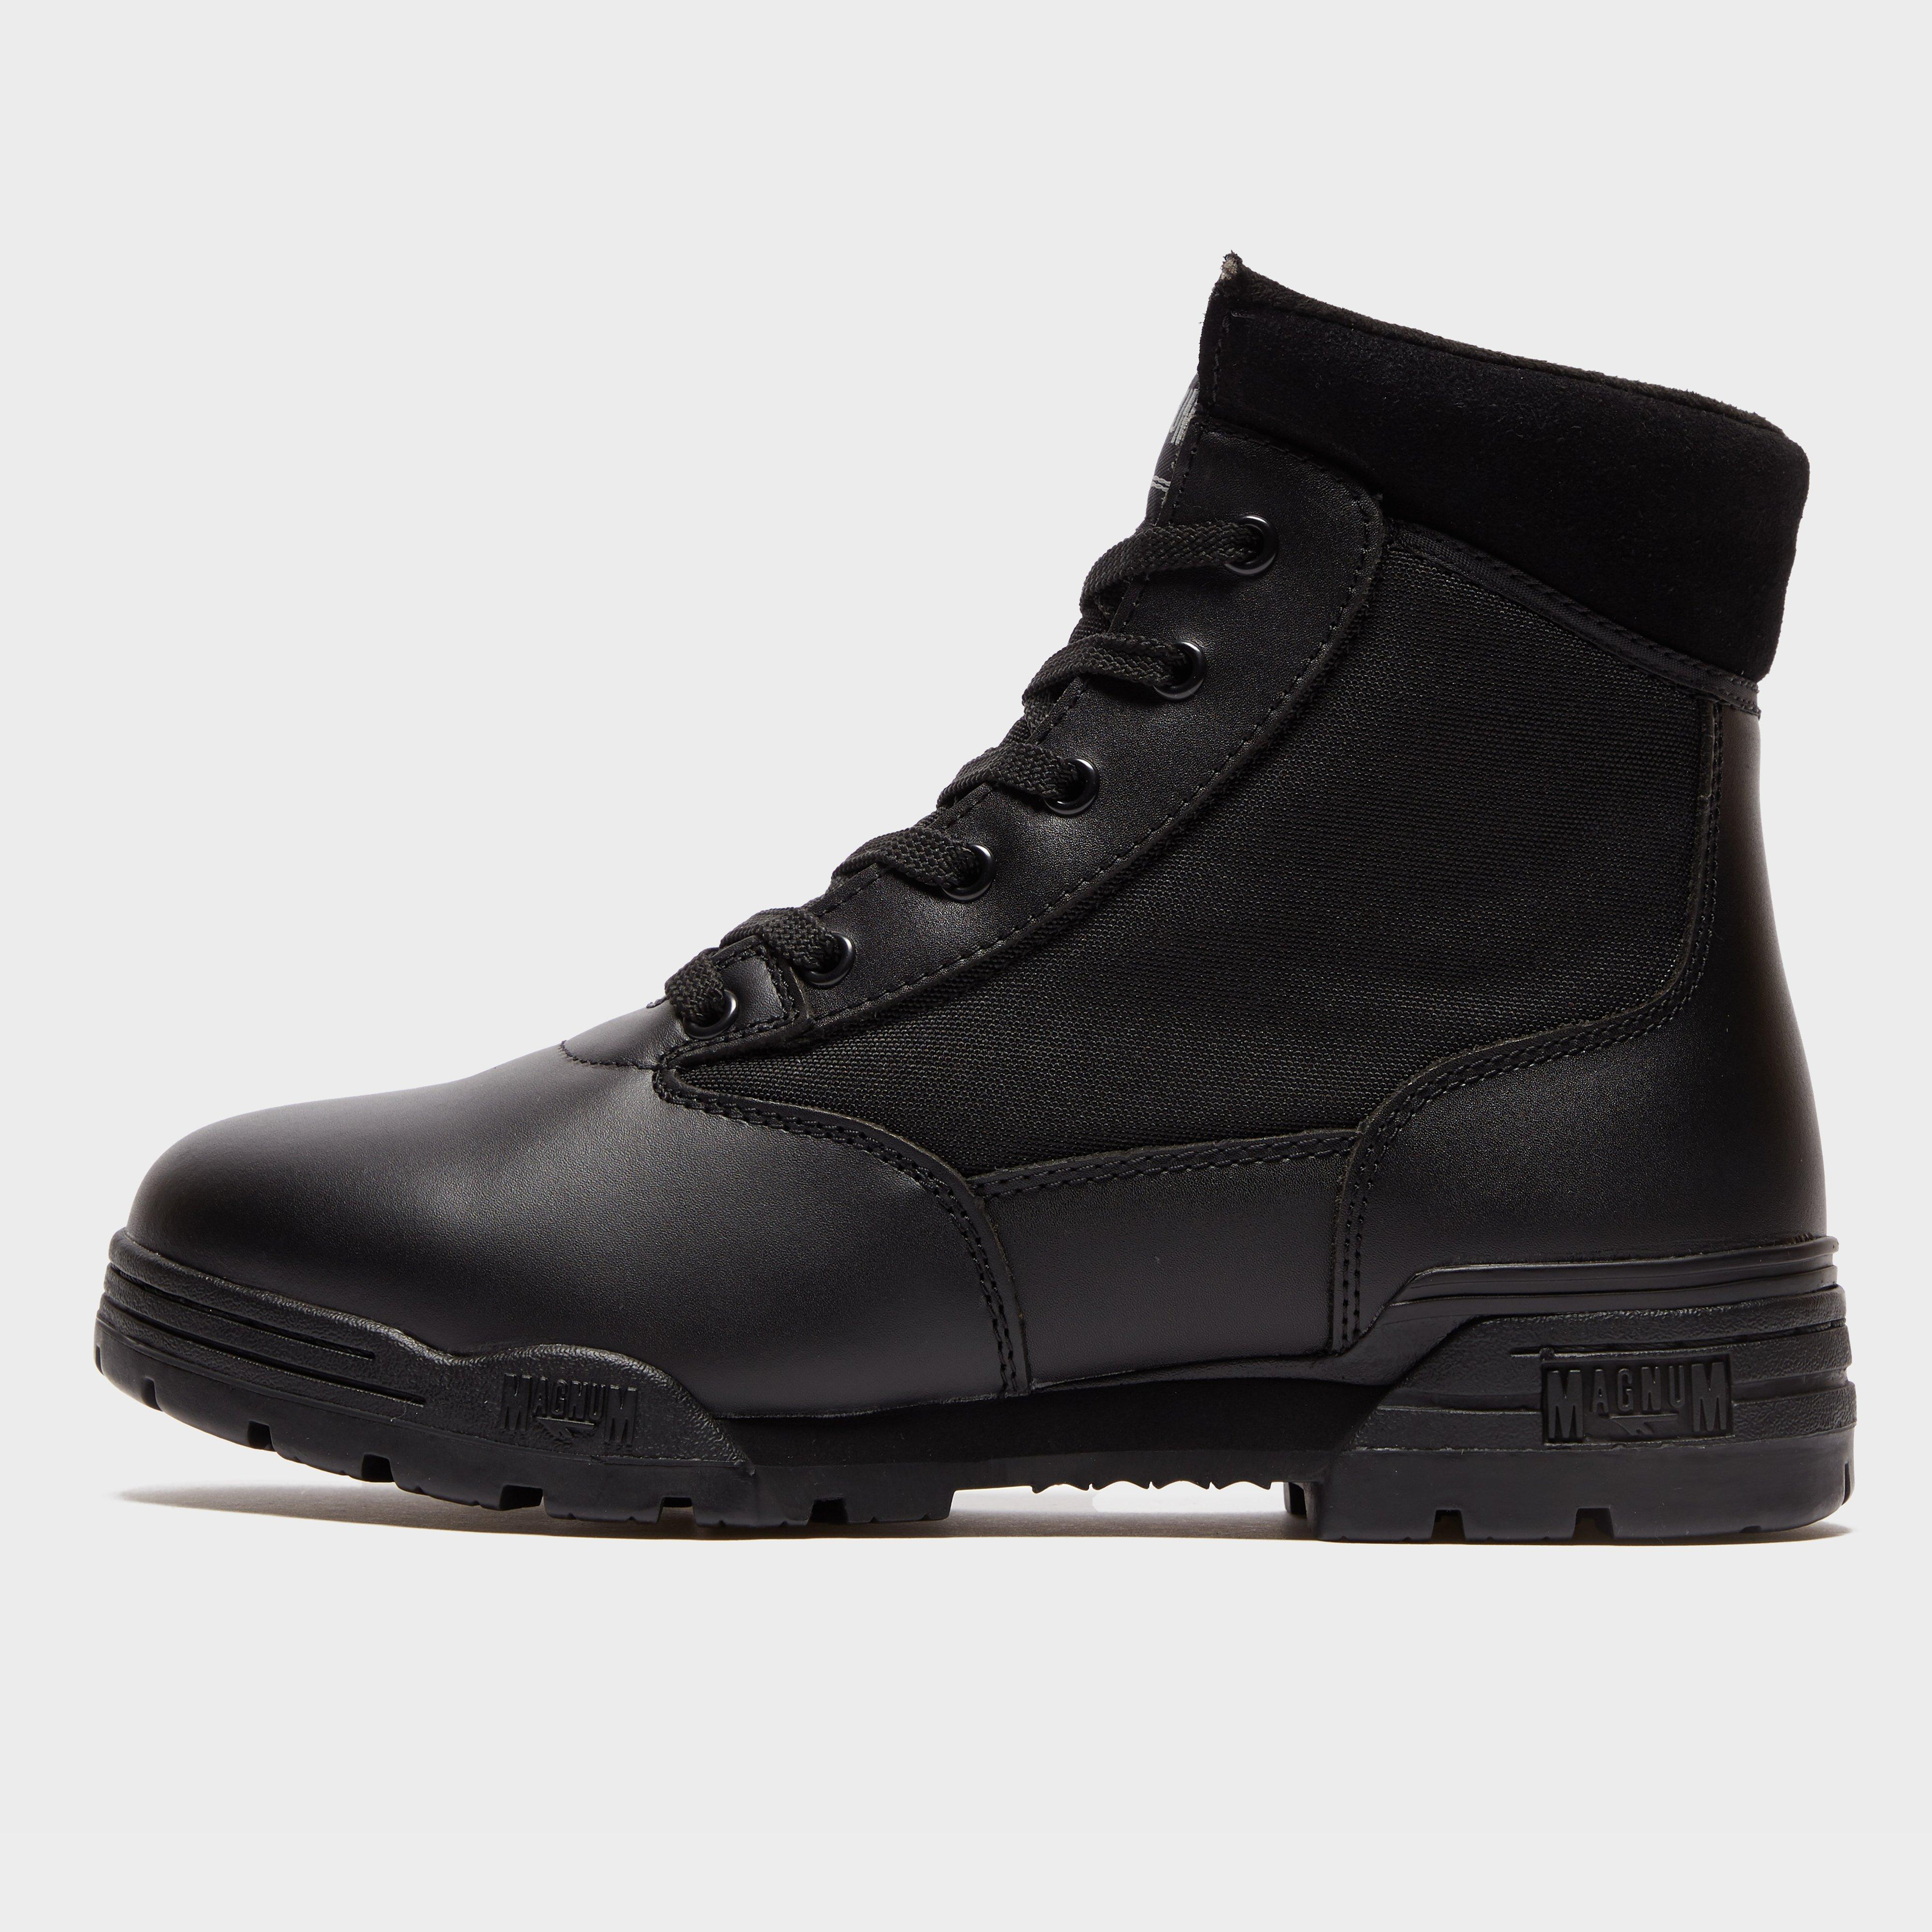 8a47d241 Magnum Classic Work Boots - 6ʺ